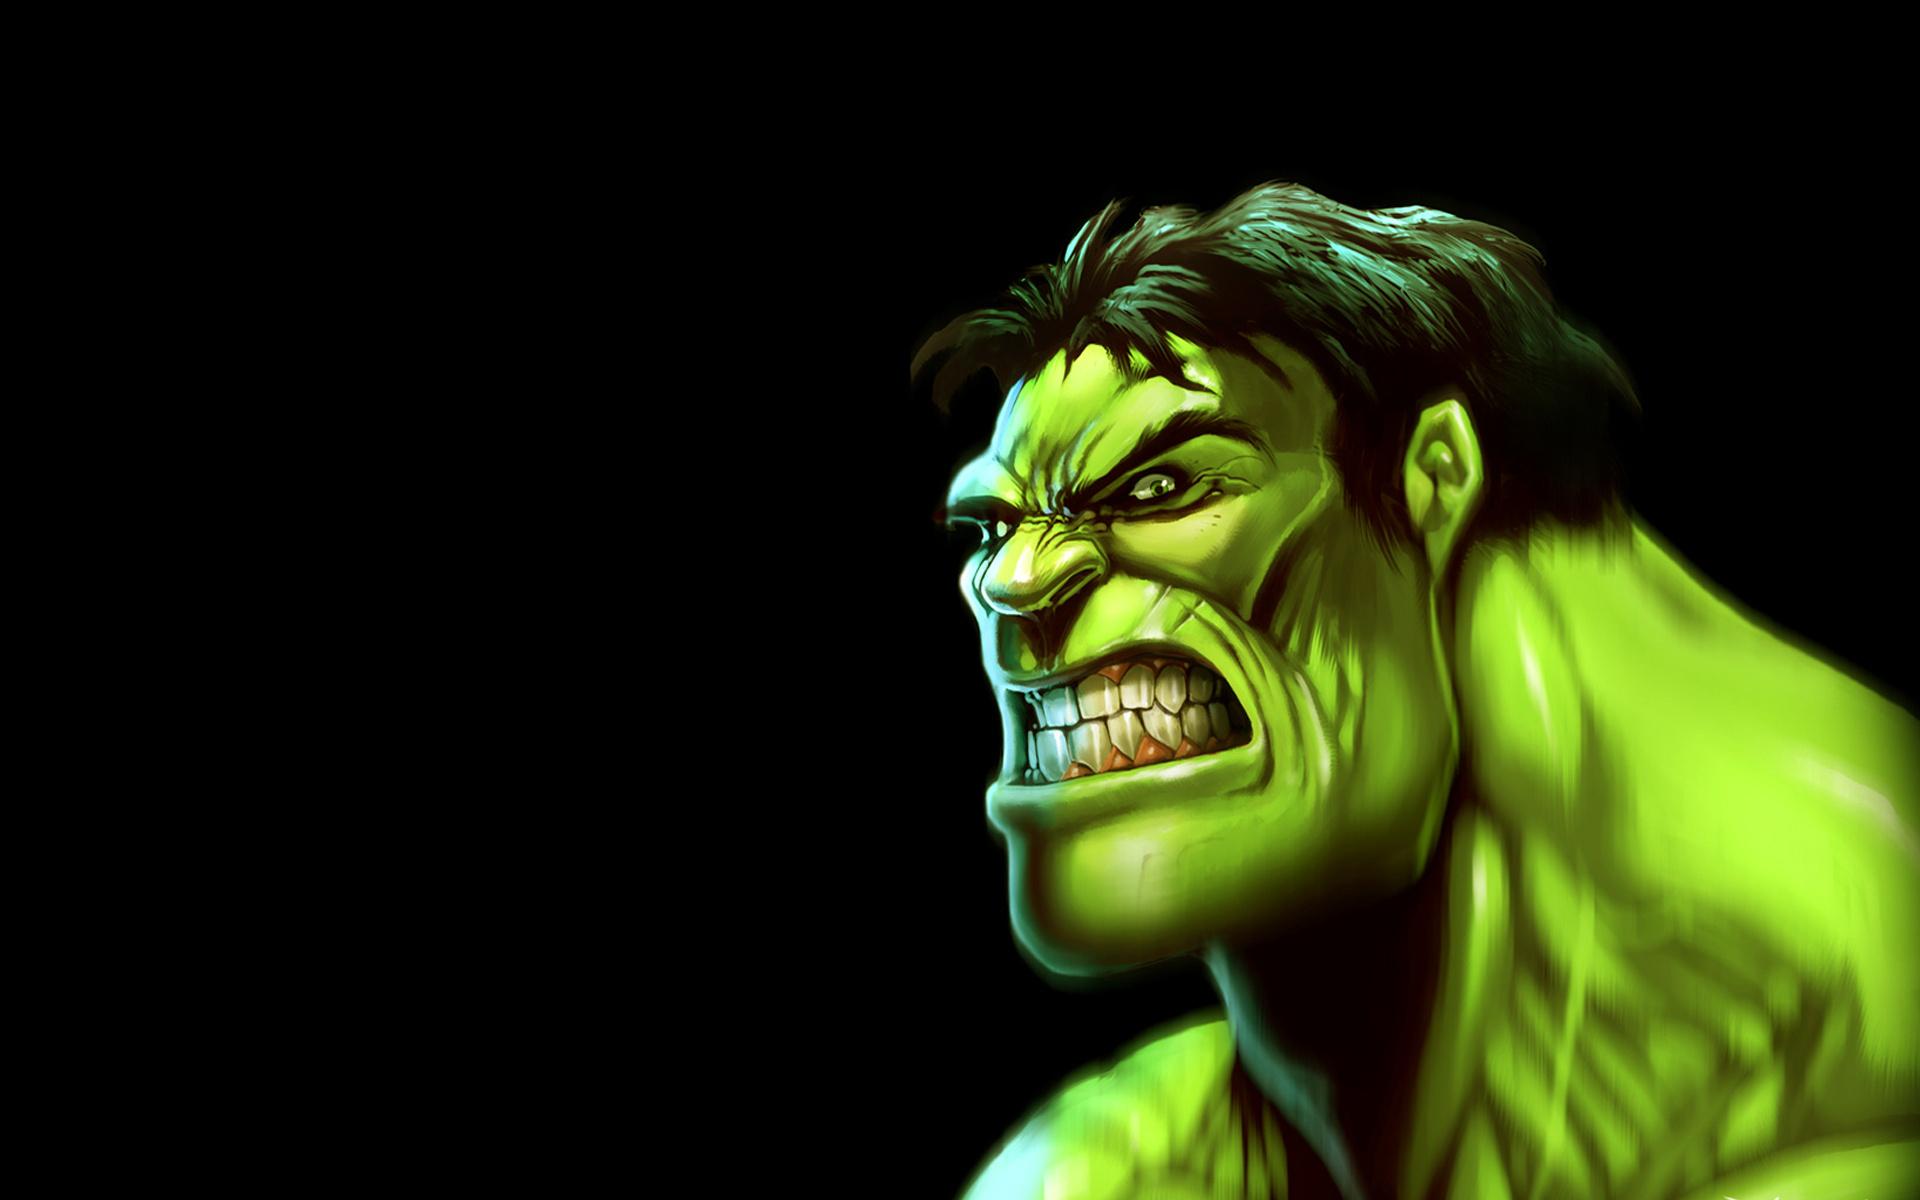 Hulk fonds d 39 cran arri res plan 1920x1200 id 245208 - Telecharger hulk ...